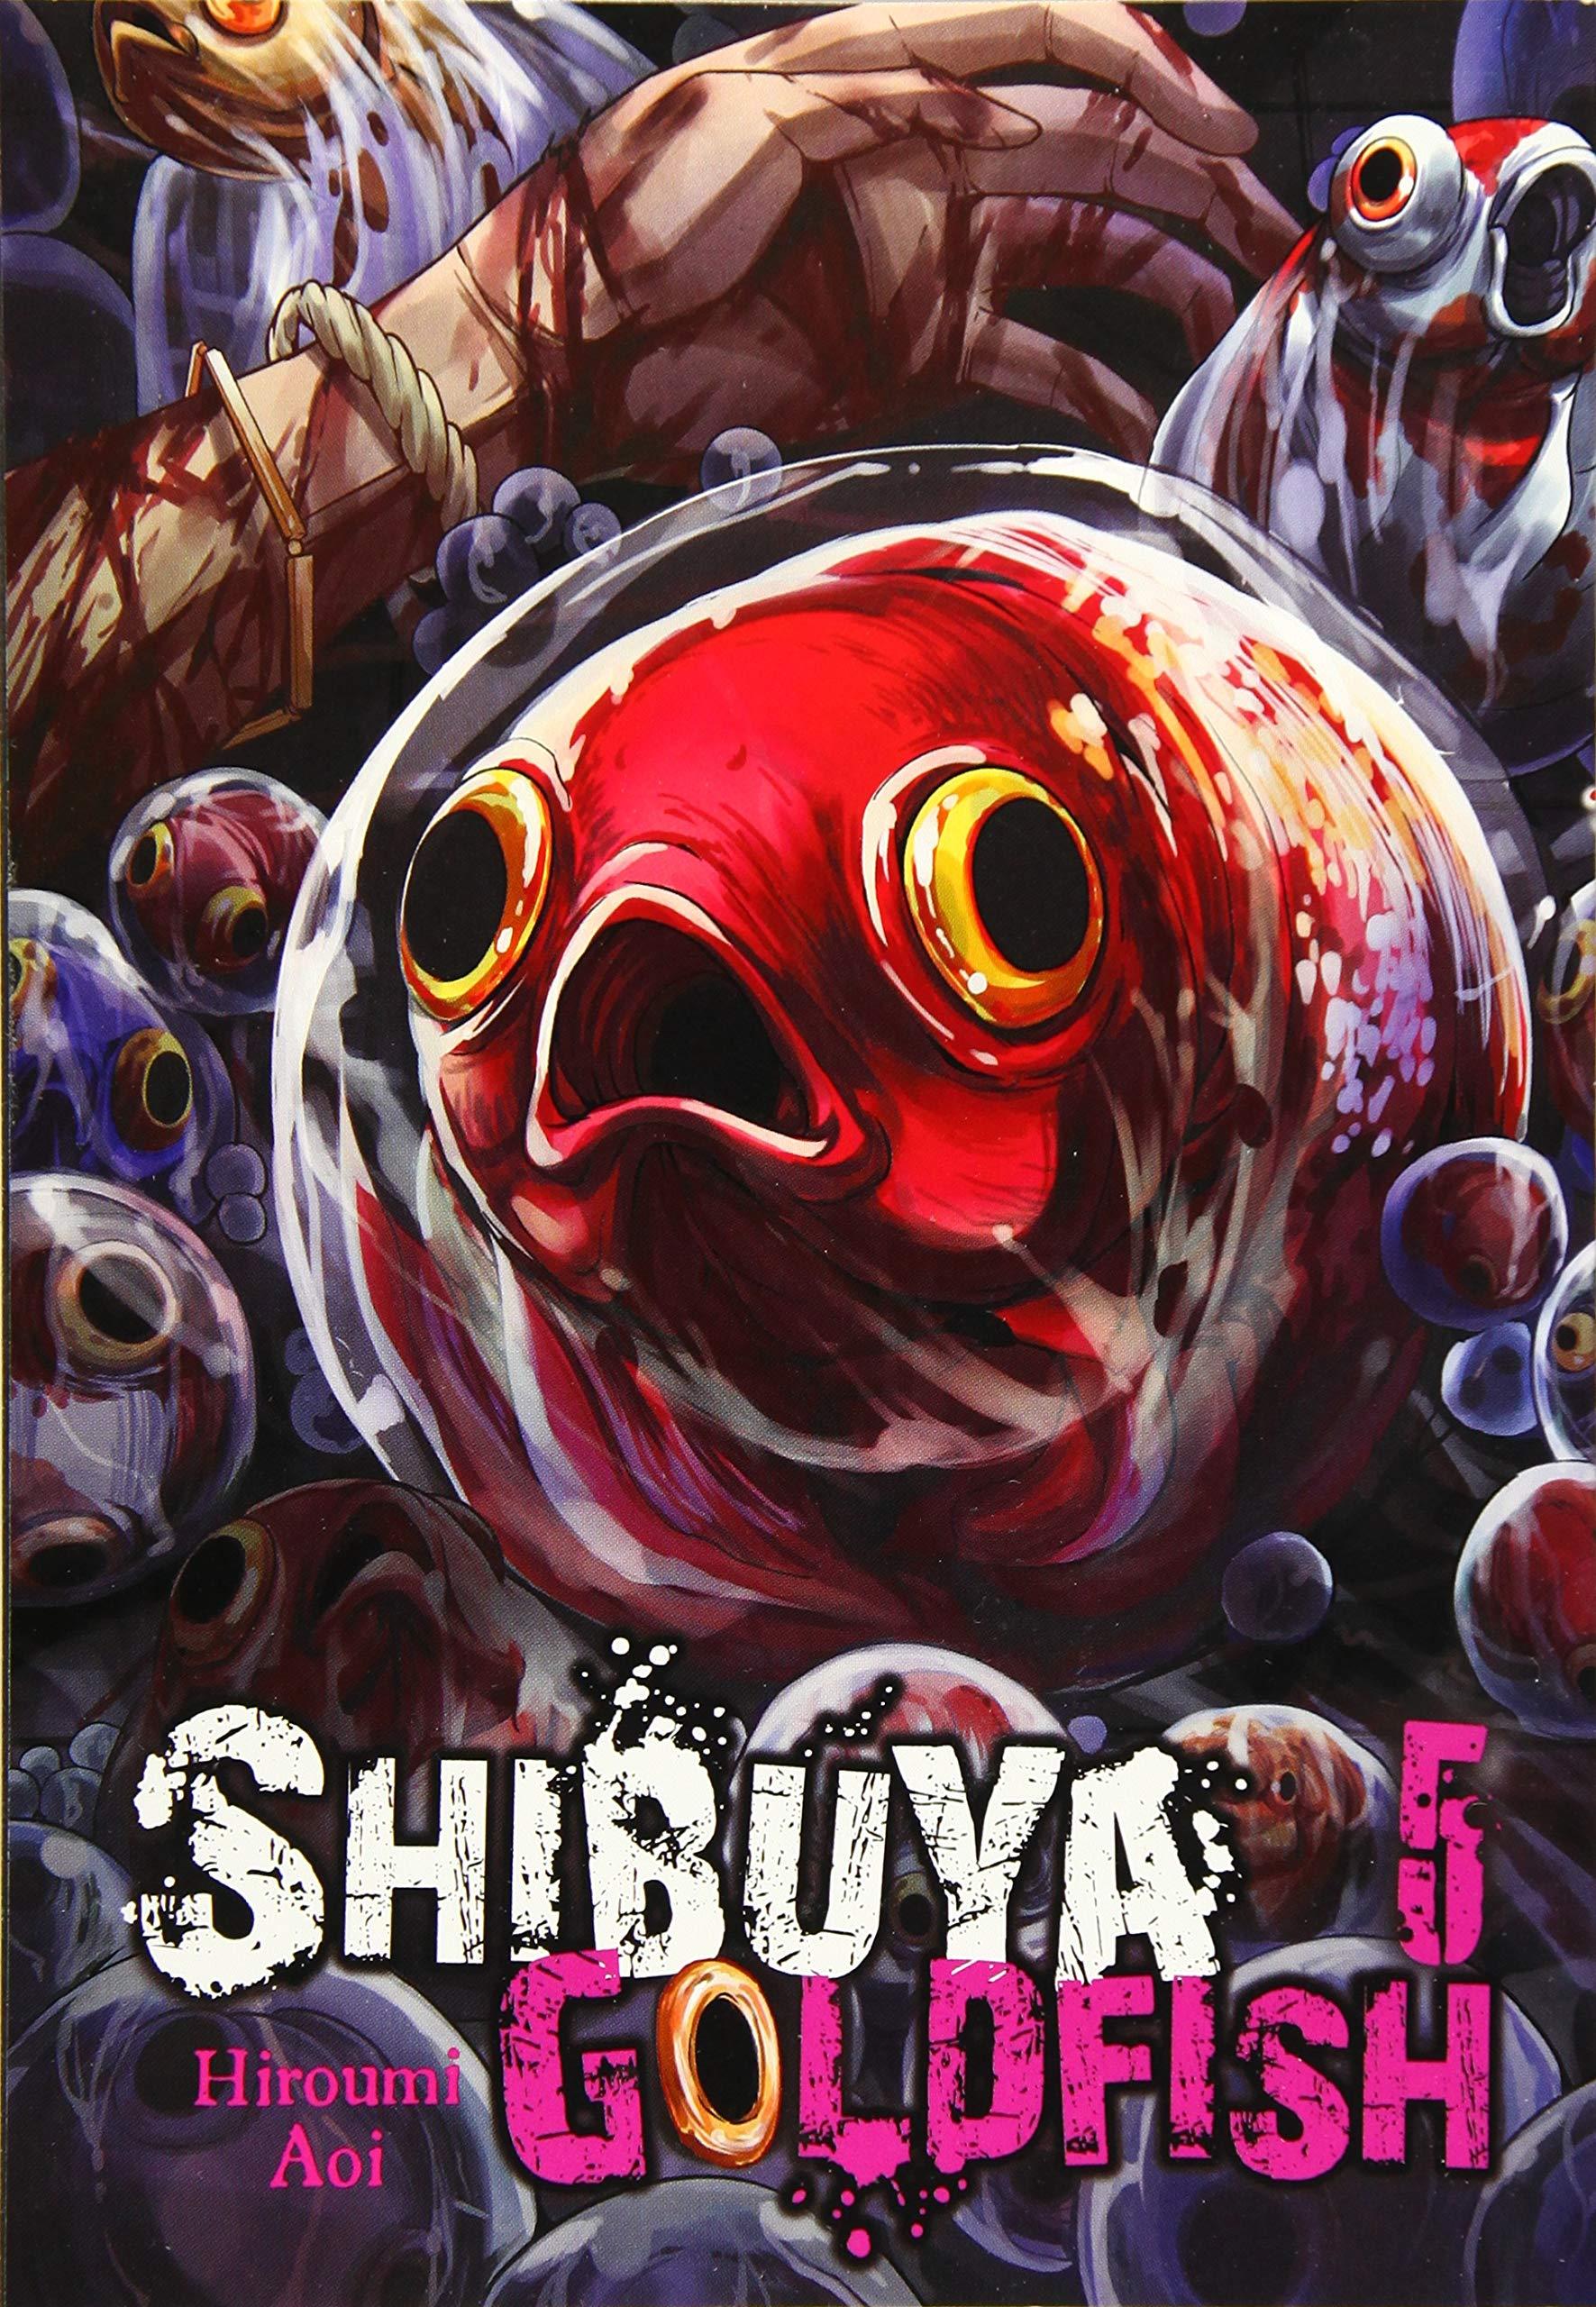 Shibuya Goldfish 5: Amazon.it: Hiroumi, Aoi: Libri in altre lingue